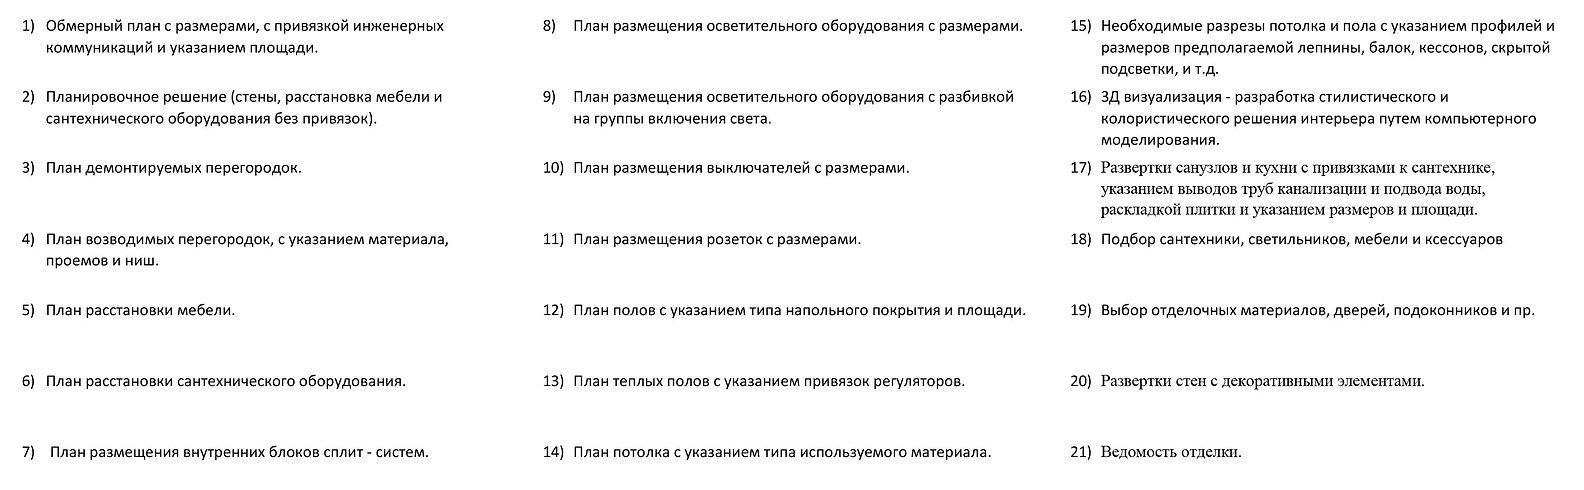 Состав проекта.jpg